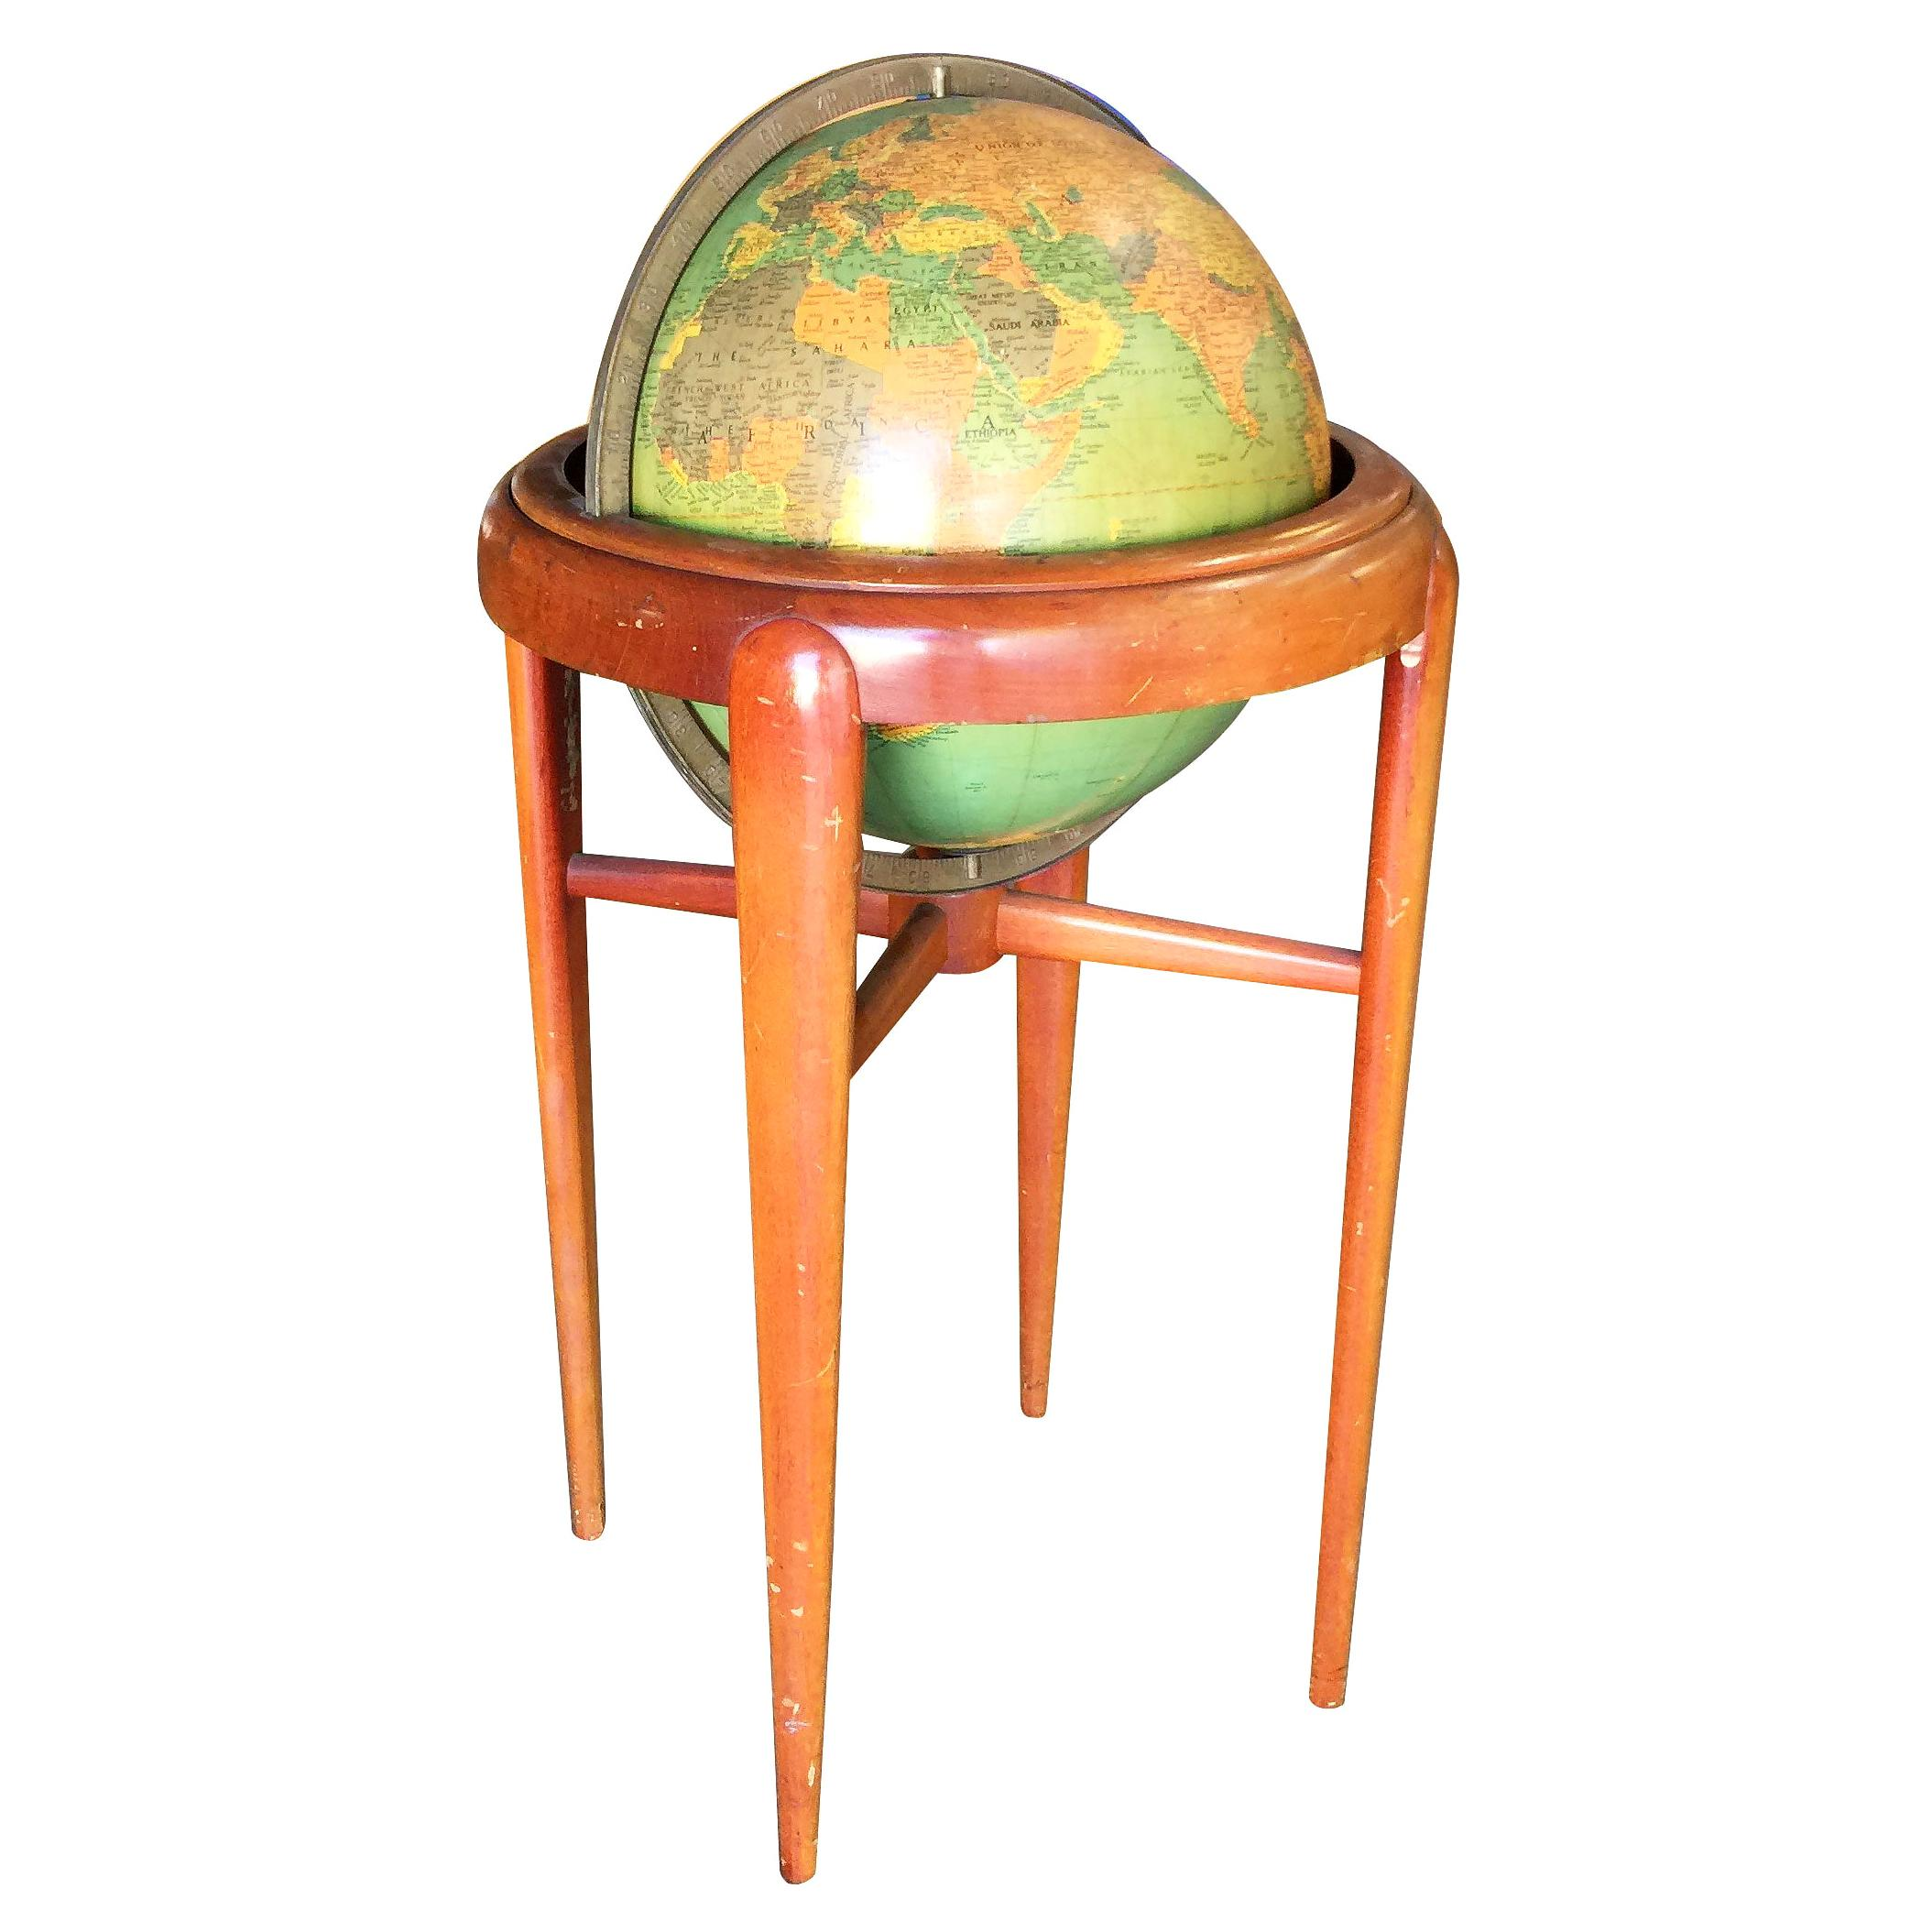 Midcentury Mahogany Floor Globe by Replogle